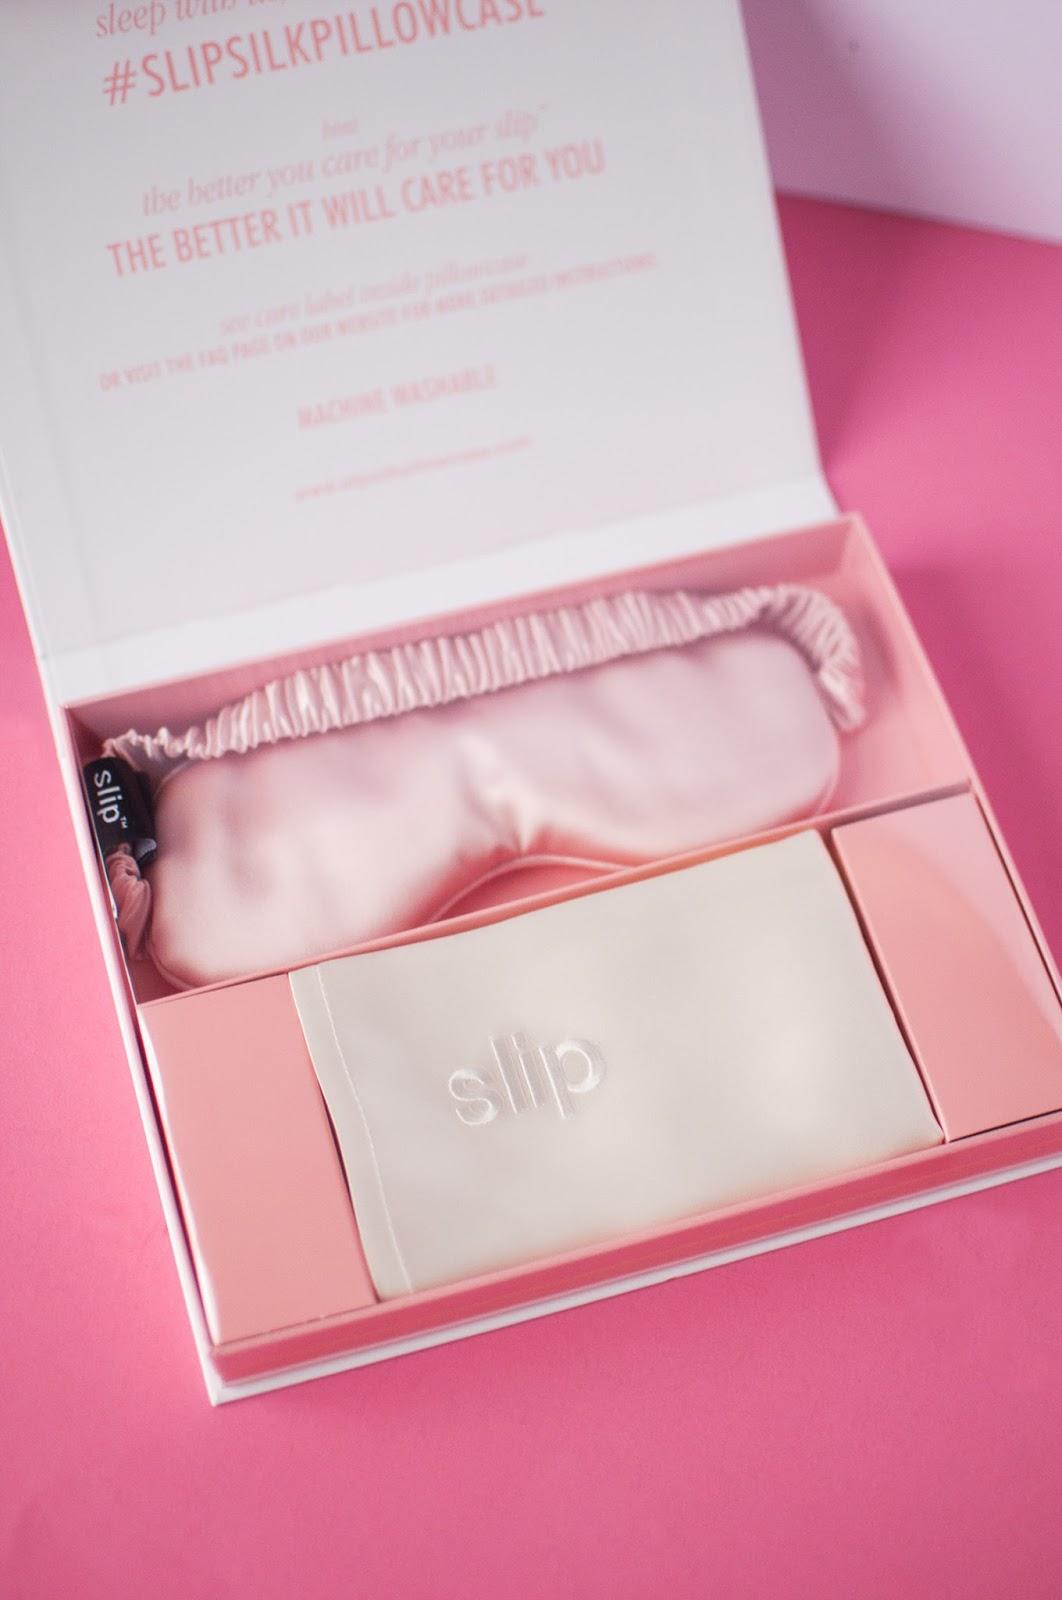 slip silk beauty collection review, slip silk worth the hype, slip silk worth the price, slip gift set